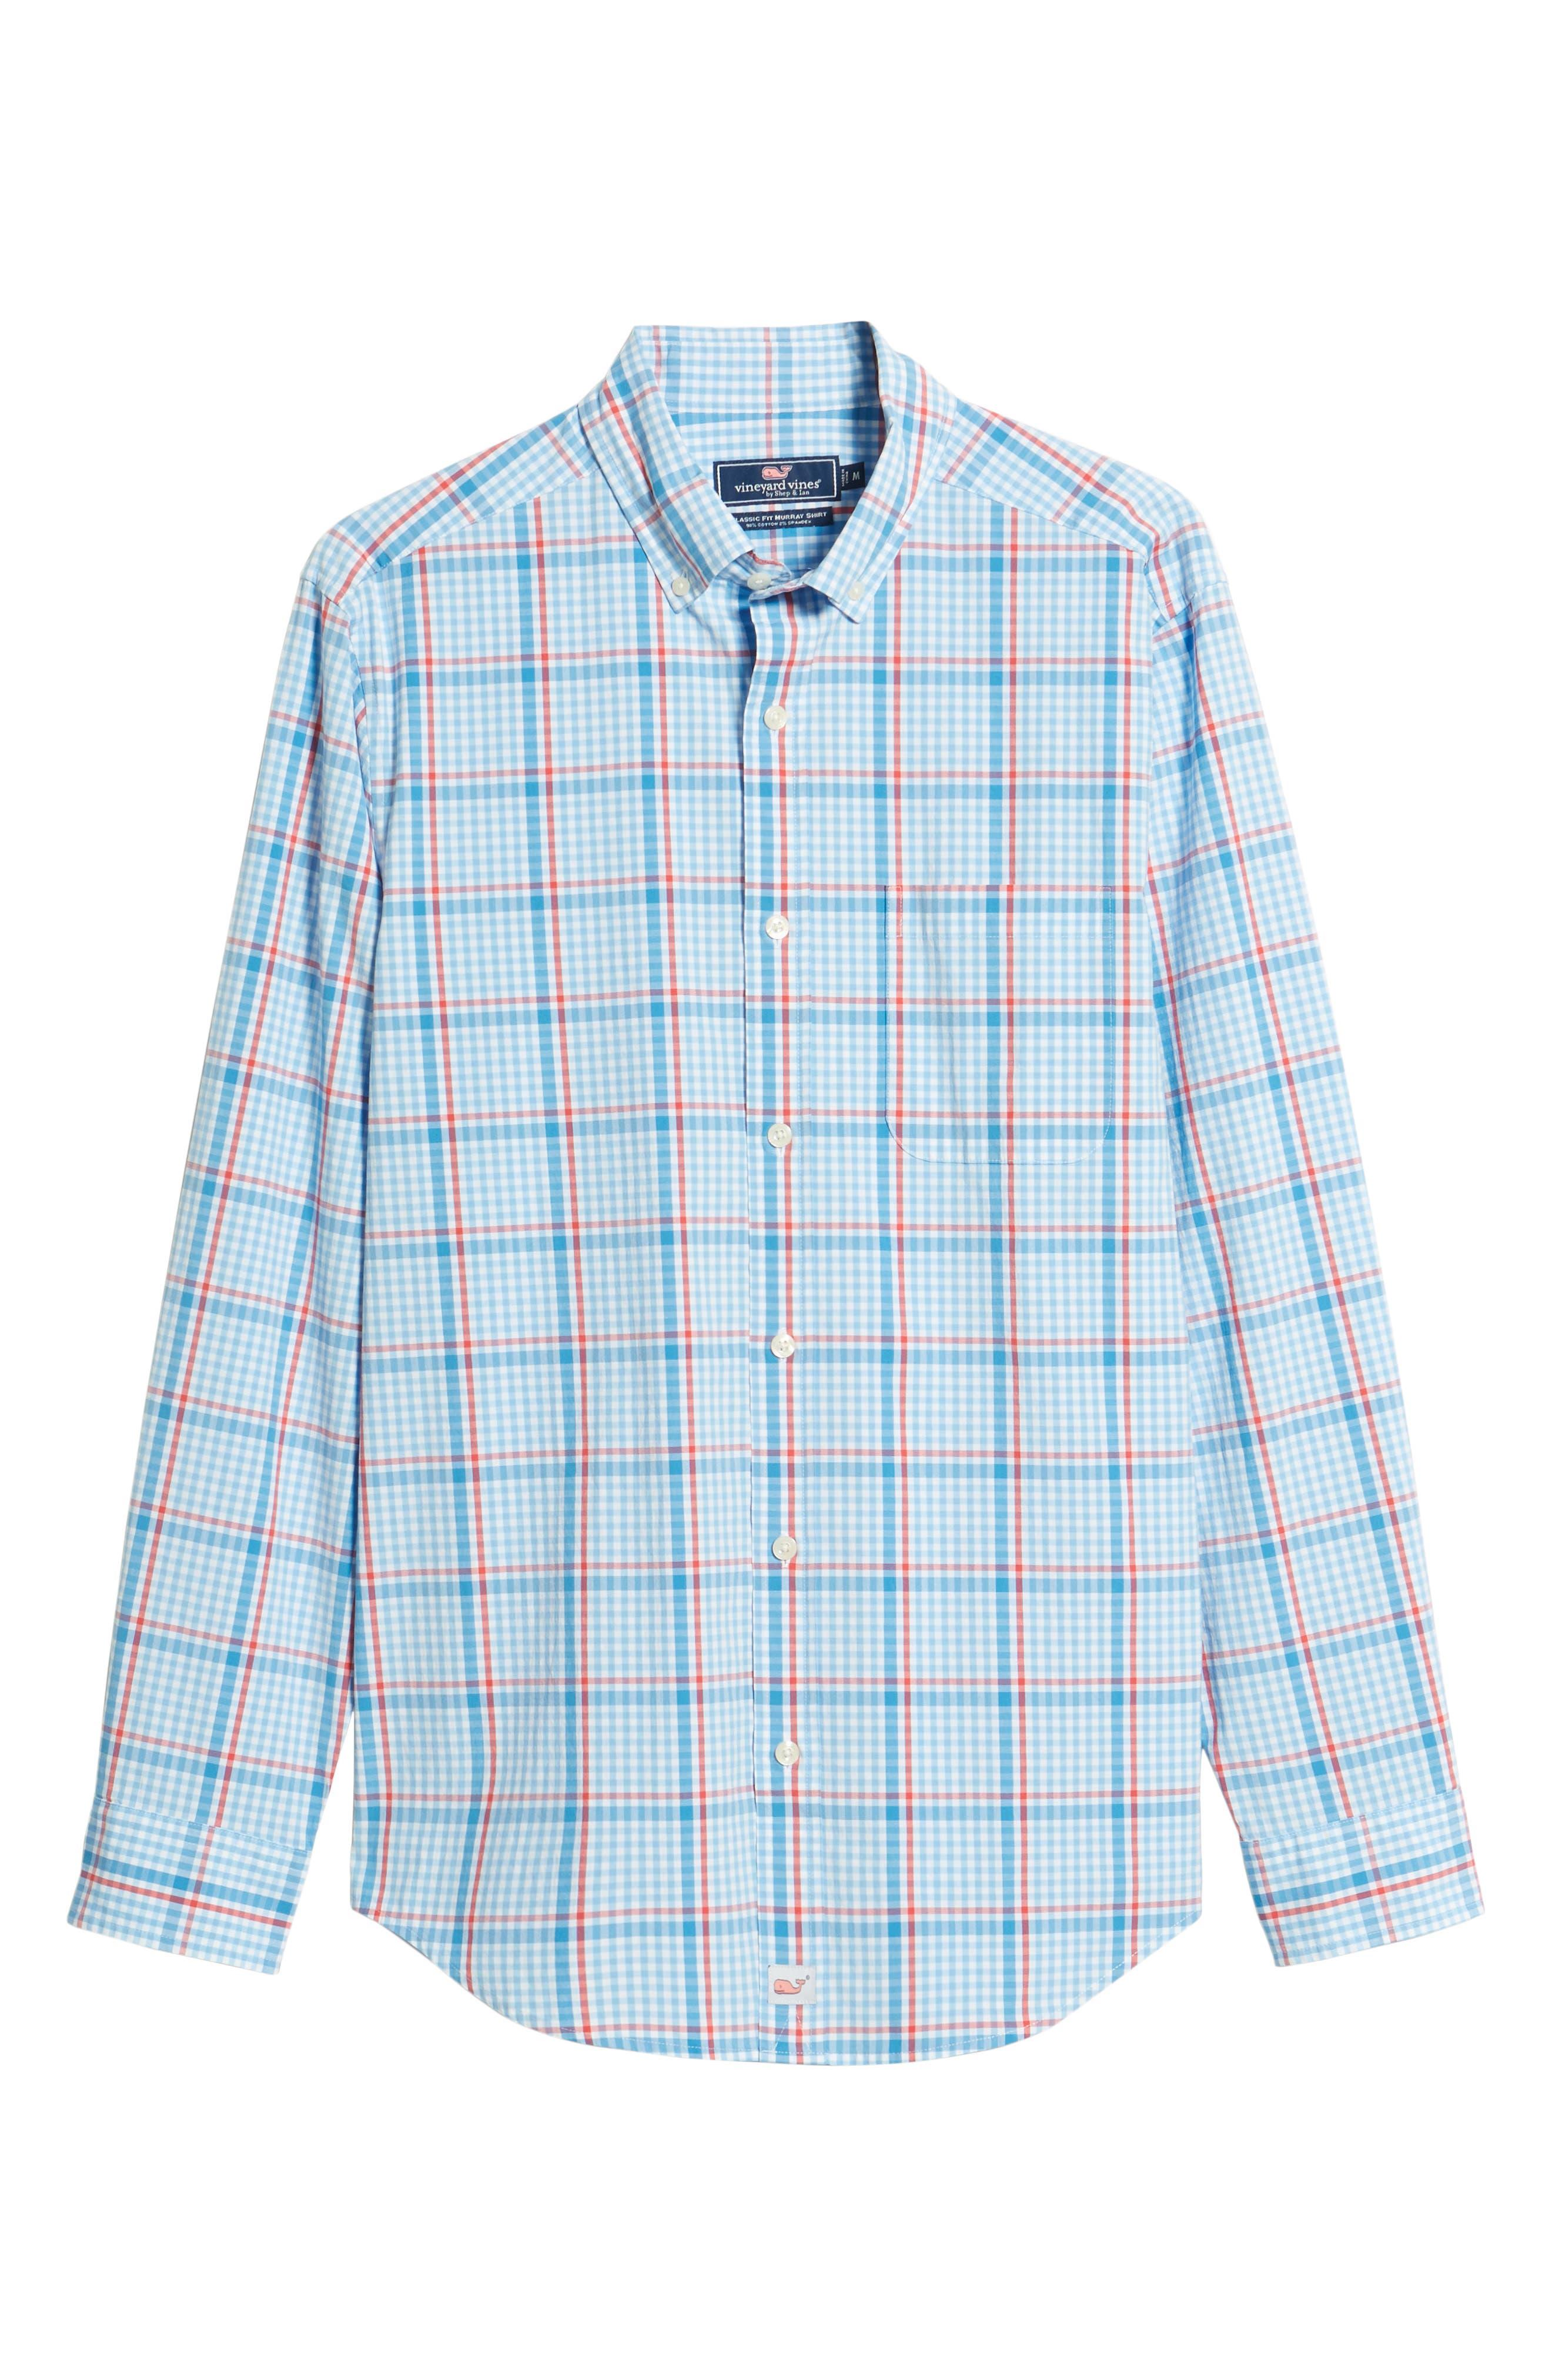 Palmer Island Classic Fit Plaid Sport Shirt,                             Alternate thumbnail 6, color,                             Ocean Breeze